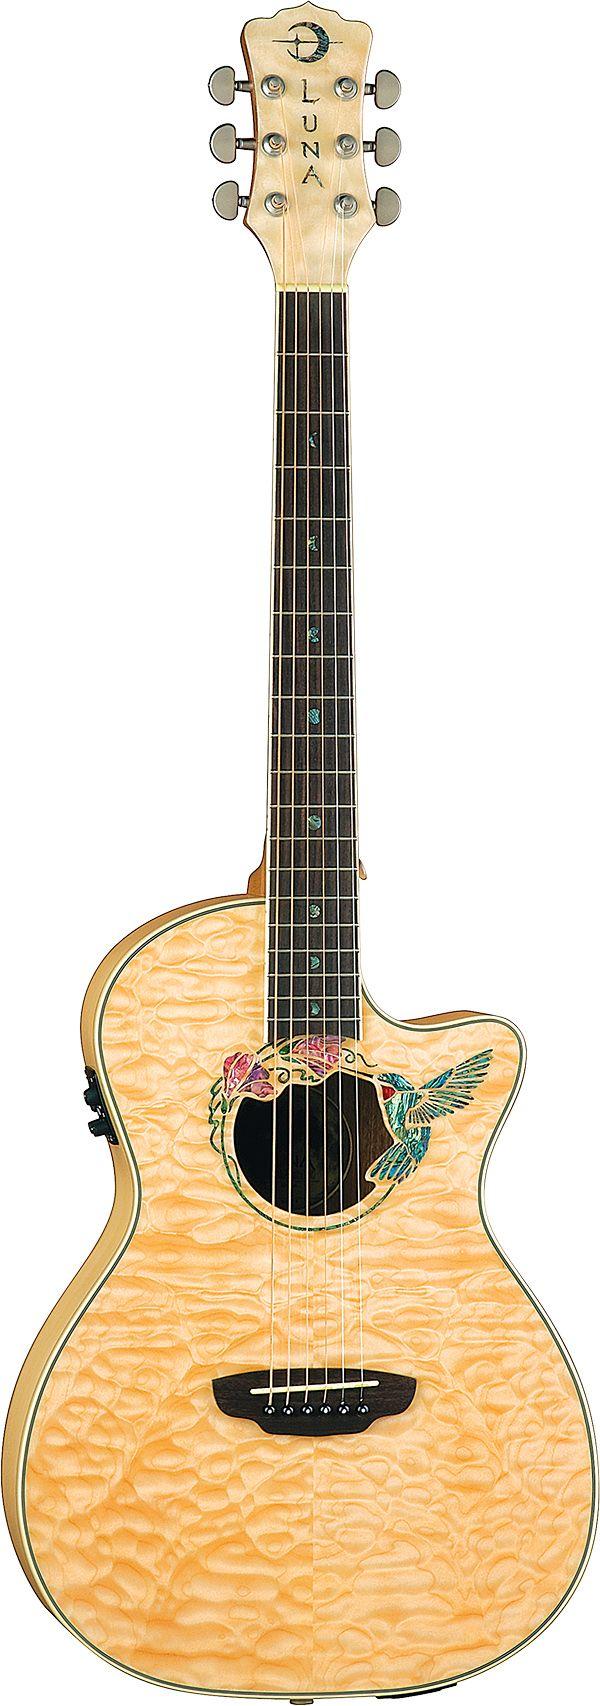 Luna Guitars - Fauna Hummingbird - acoustic electric guitar